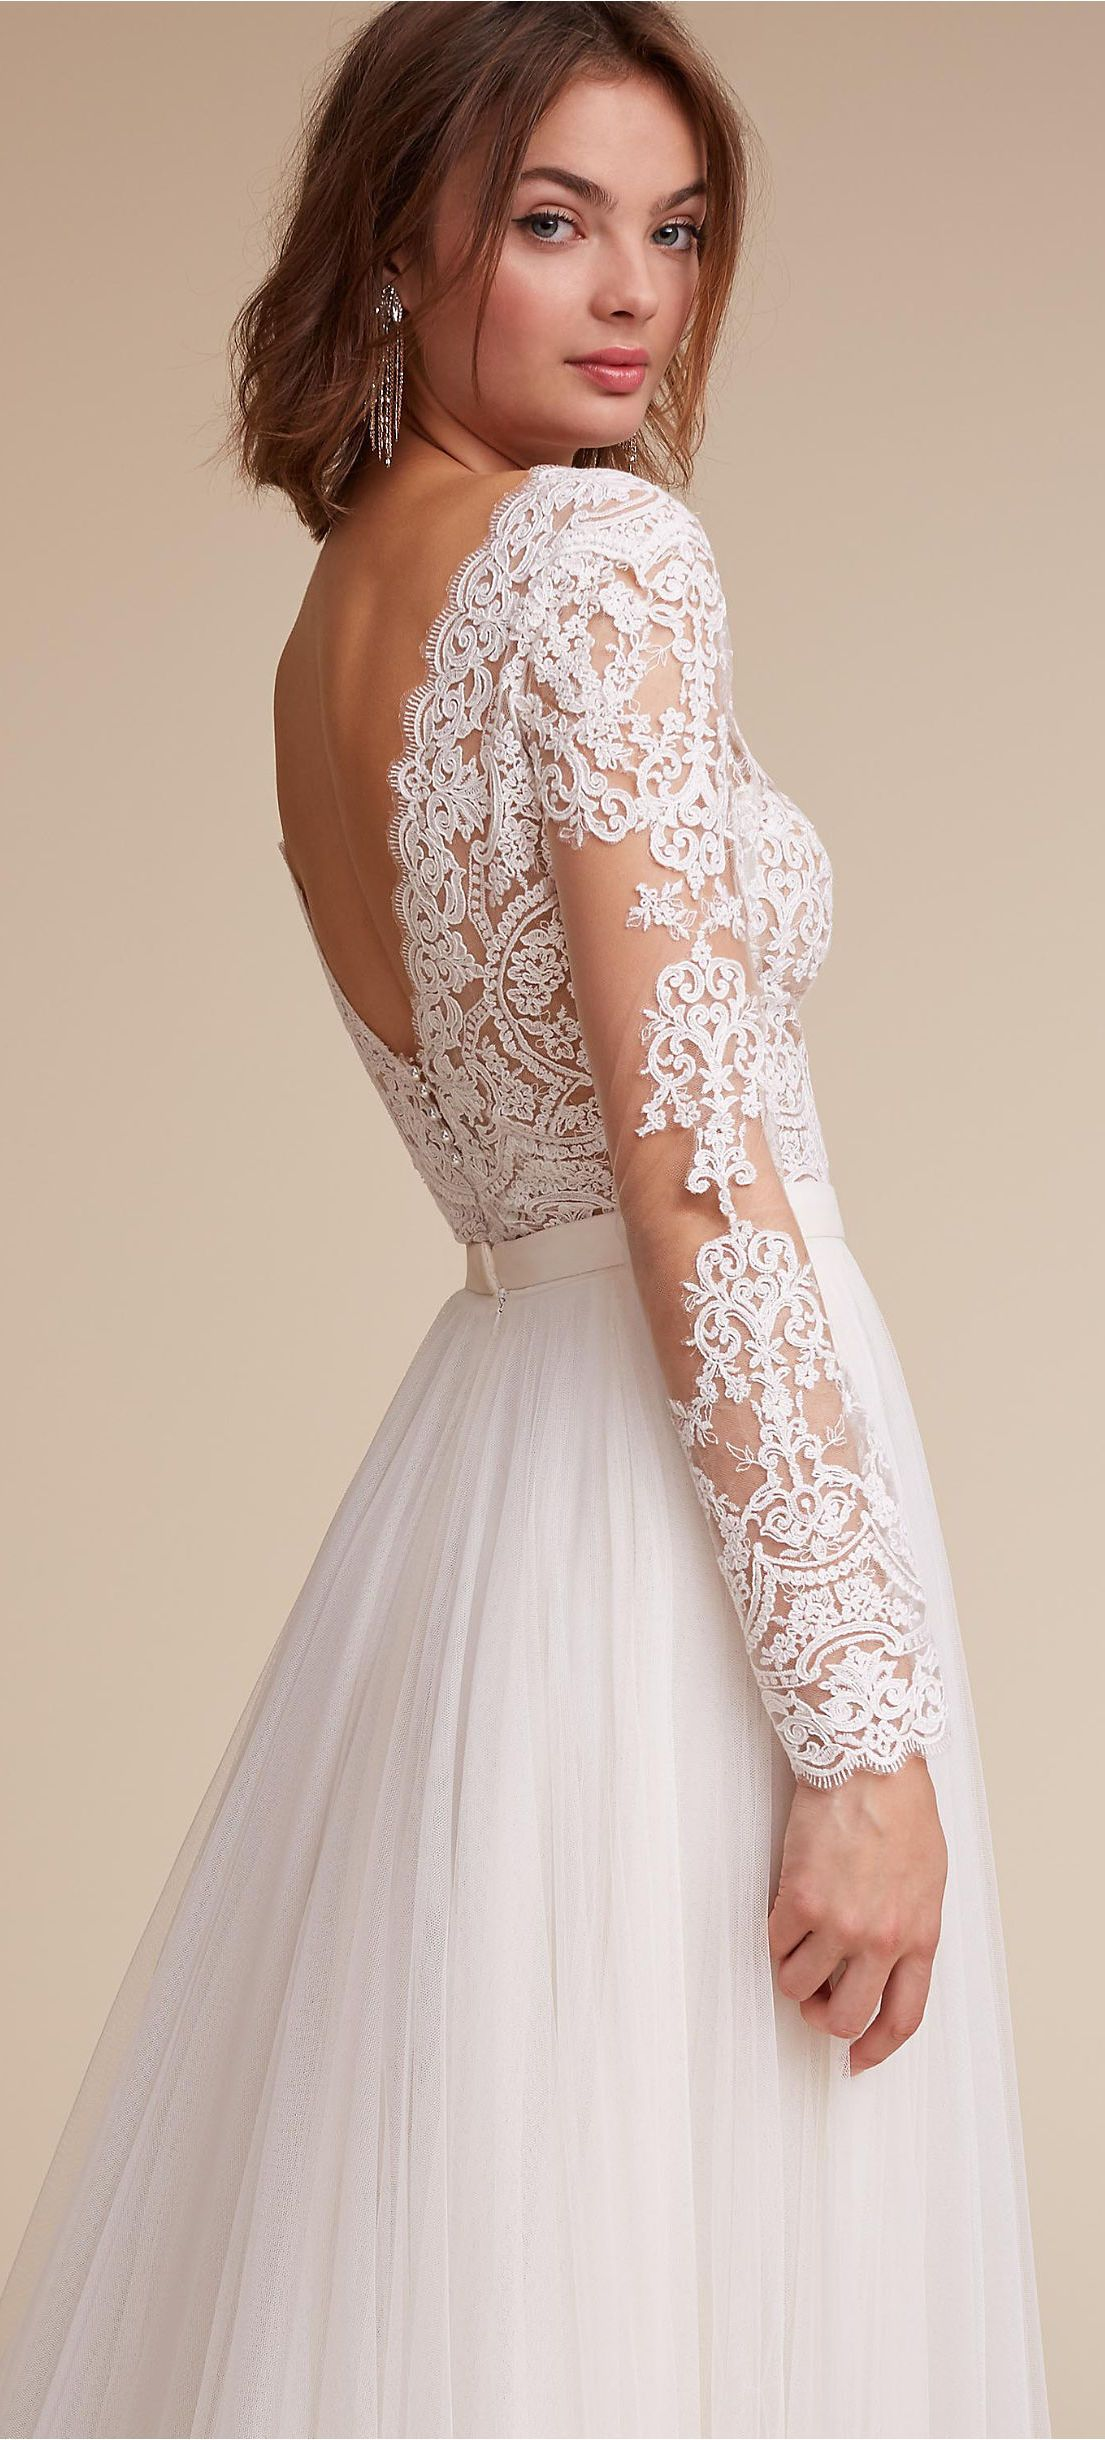 Long-sleeve Lace Wedding Dress By BHLDN